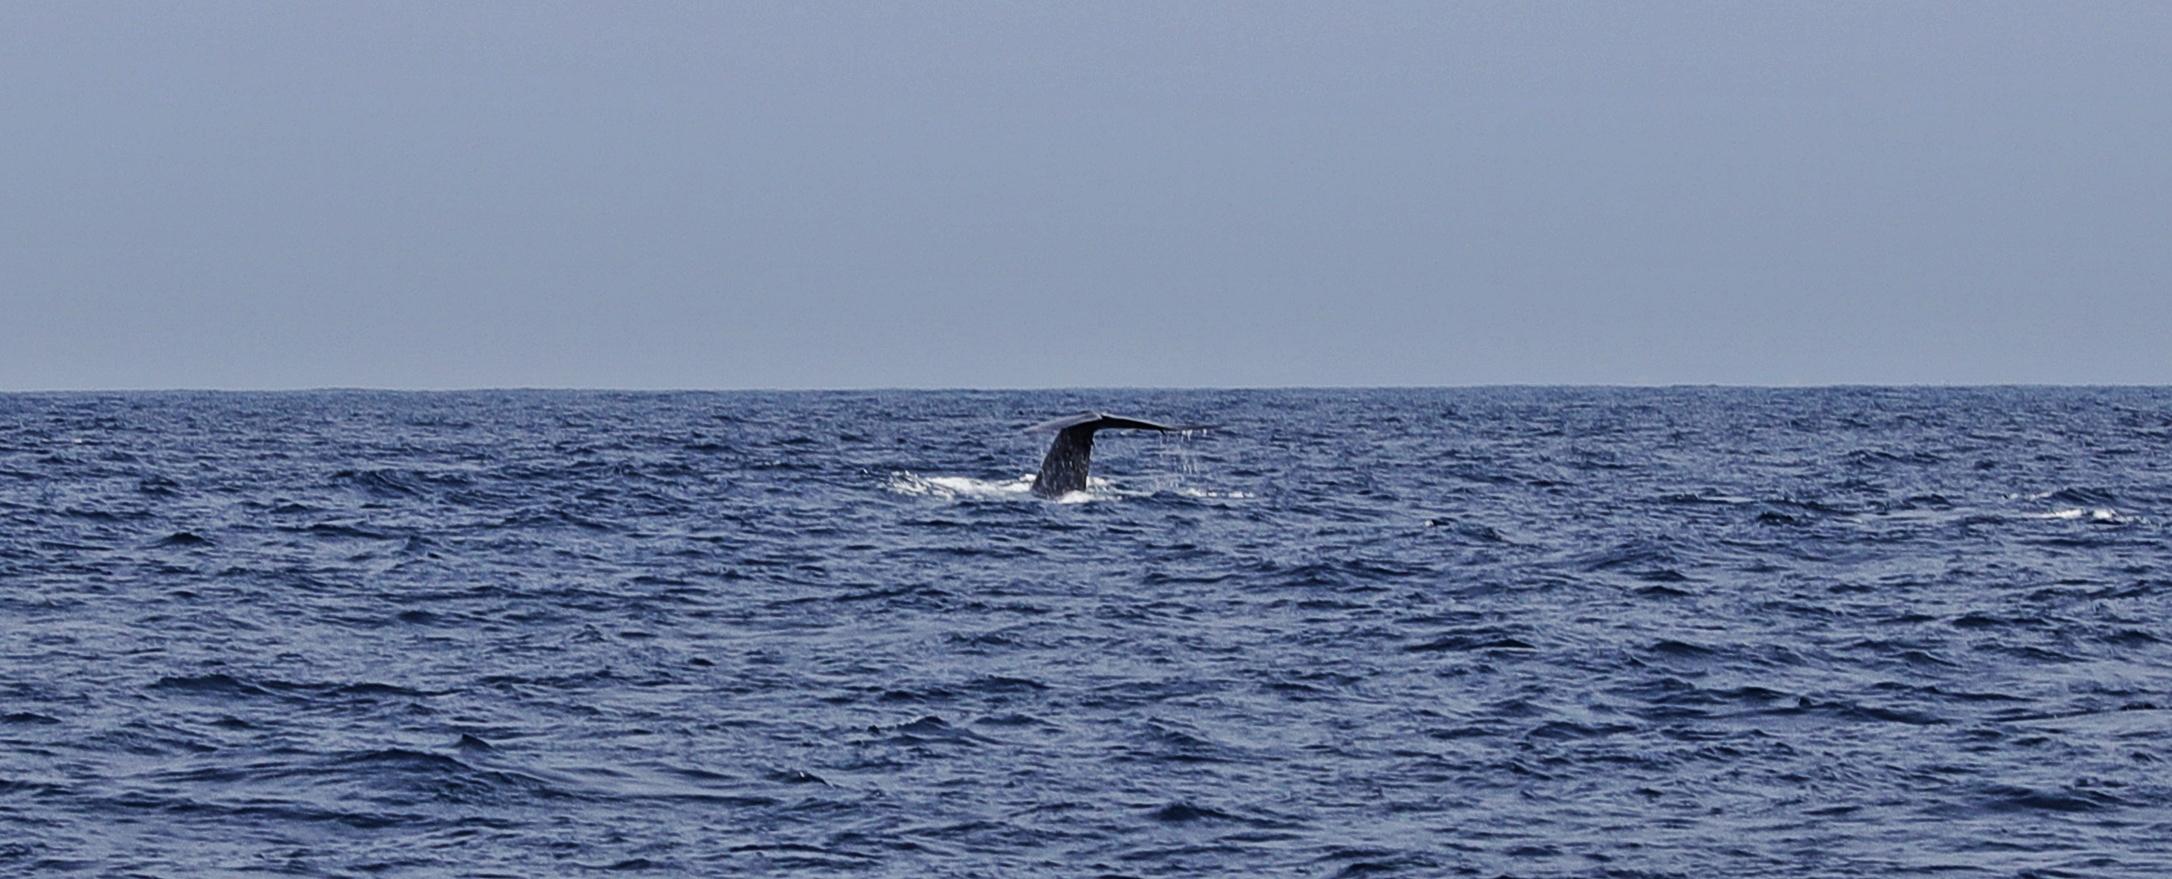 Blue whale's tail, Mirissa, Sri Lanka